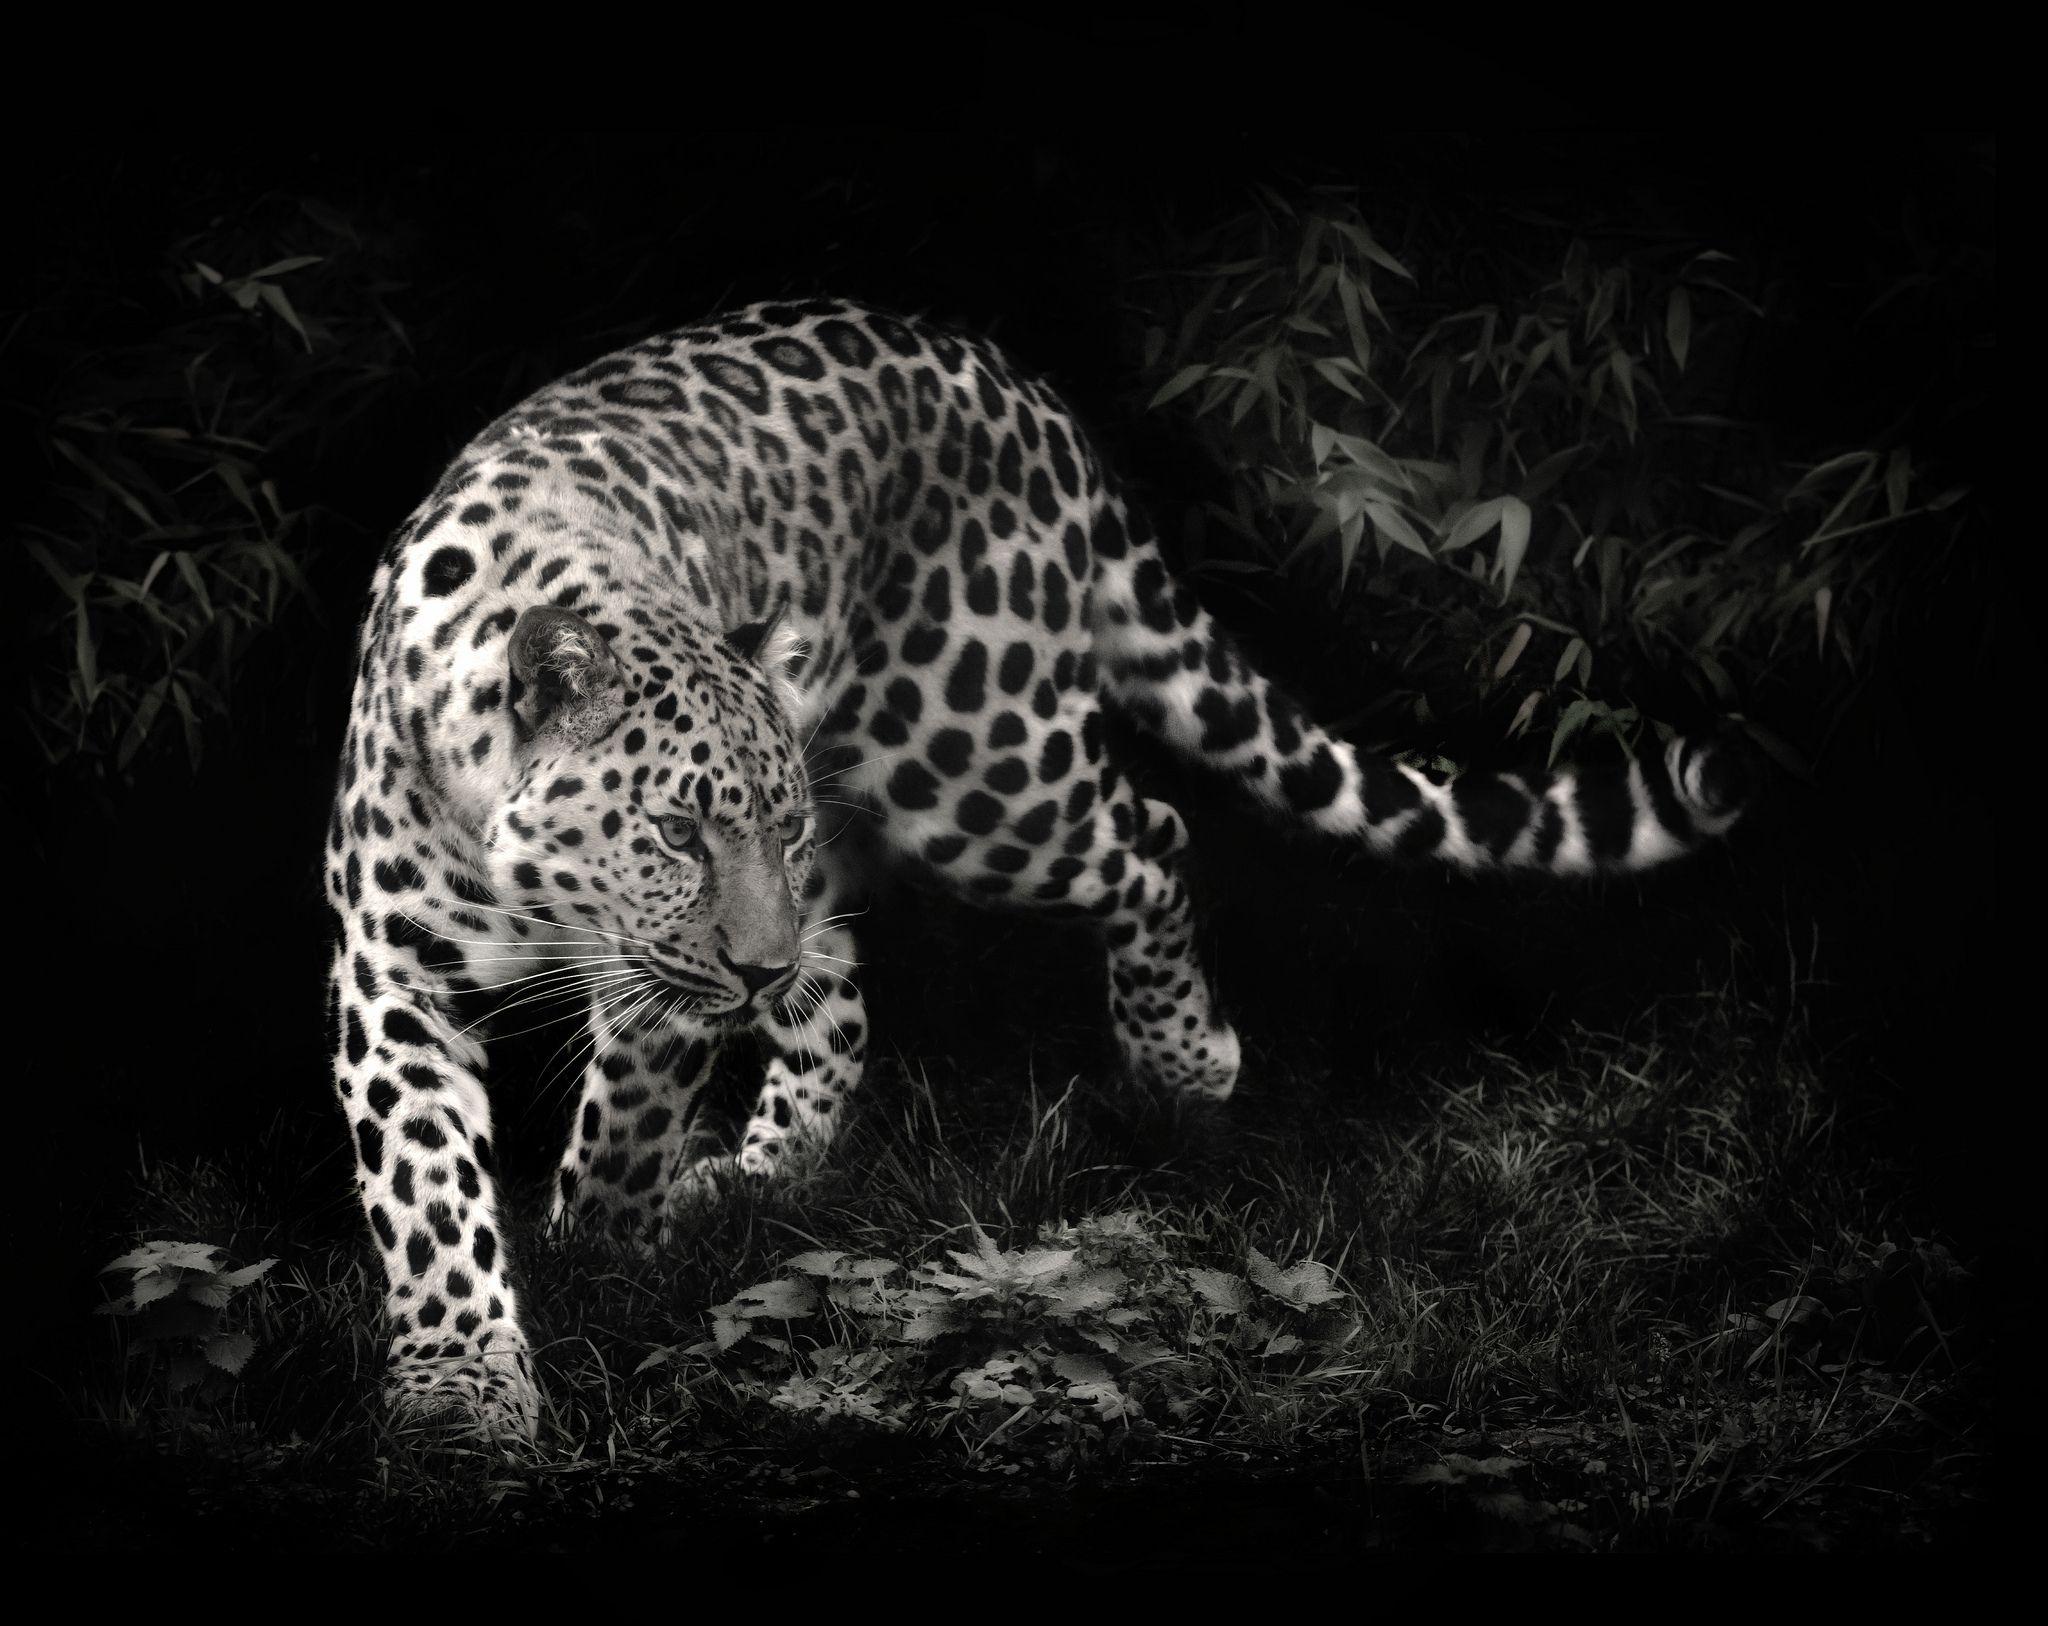 Wallpapers backgrounds animal pak supreme print pack wallpaper - Leopard Hd Wallpapers Backgrounds Wallpaper